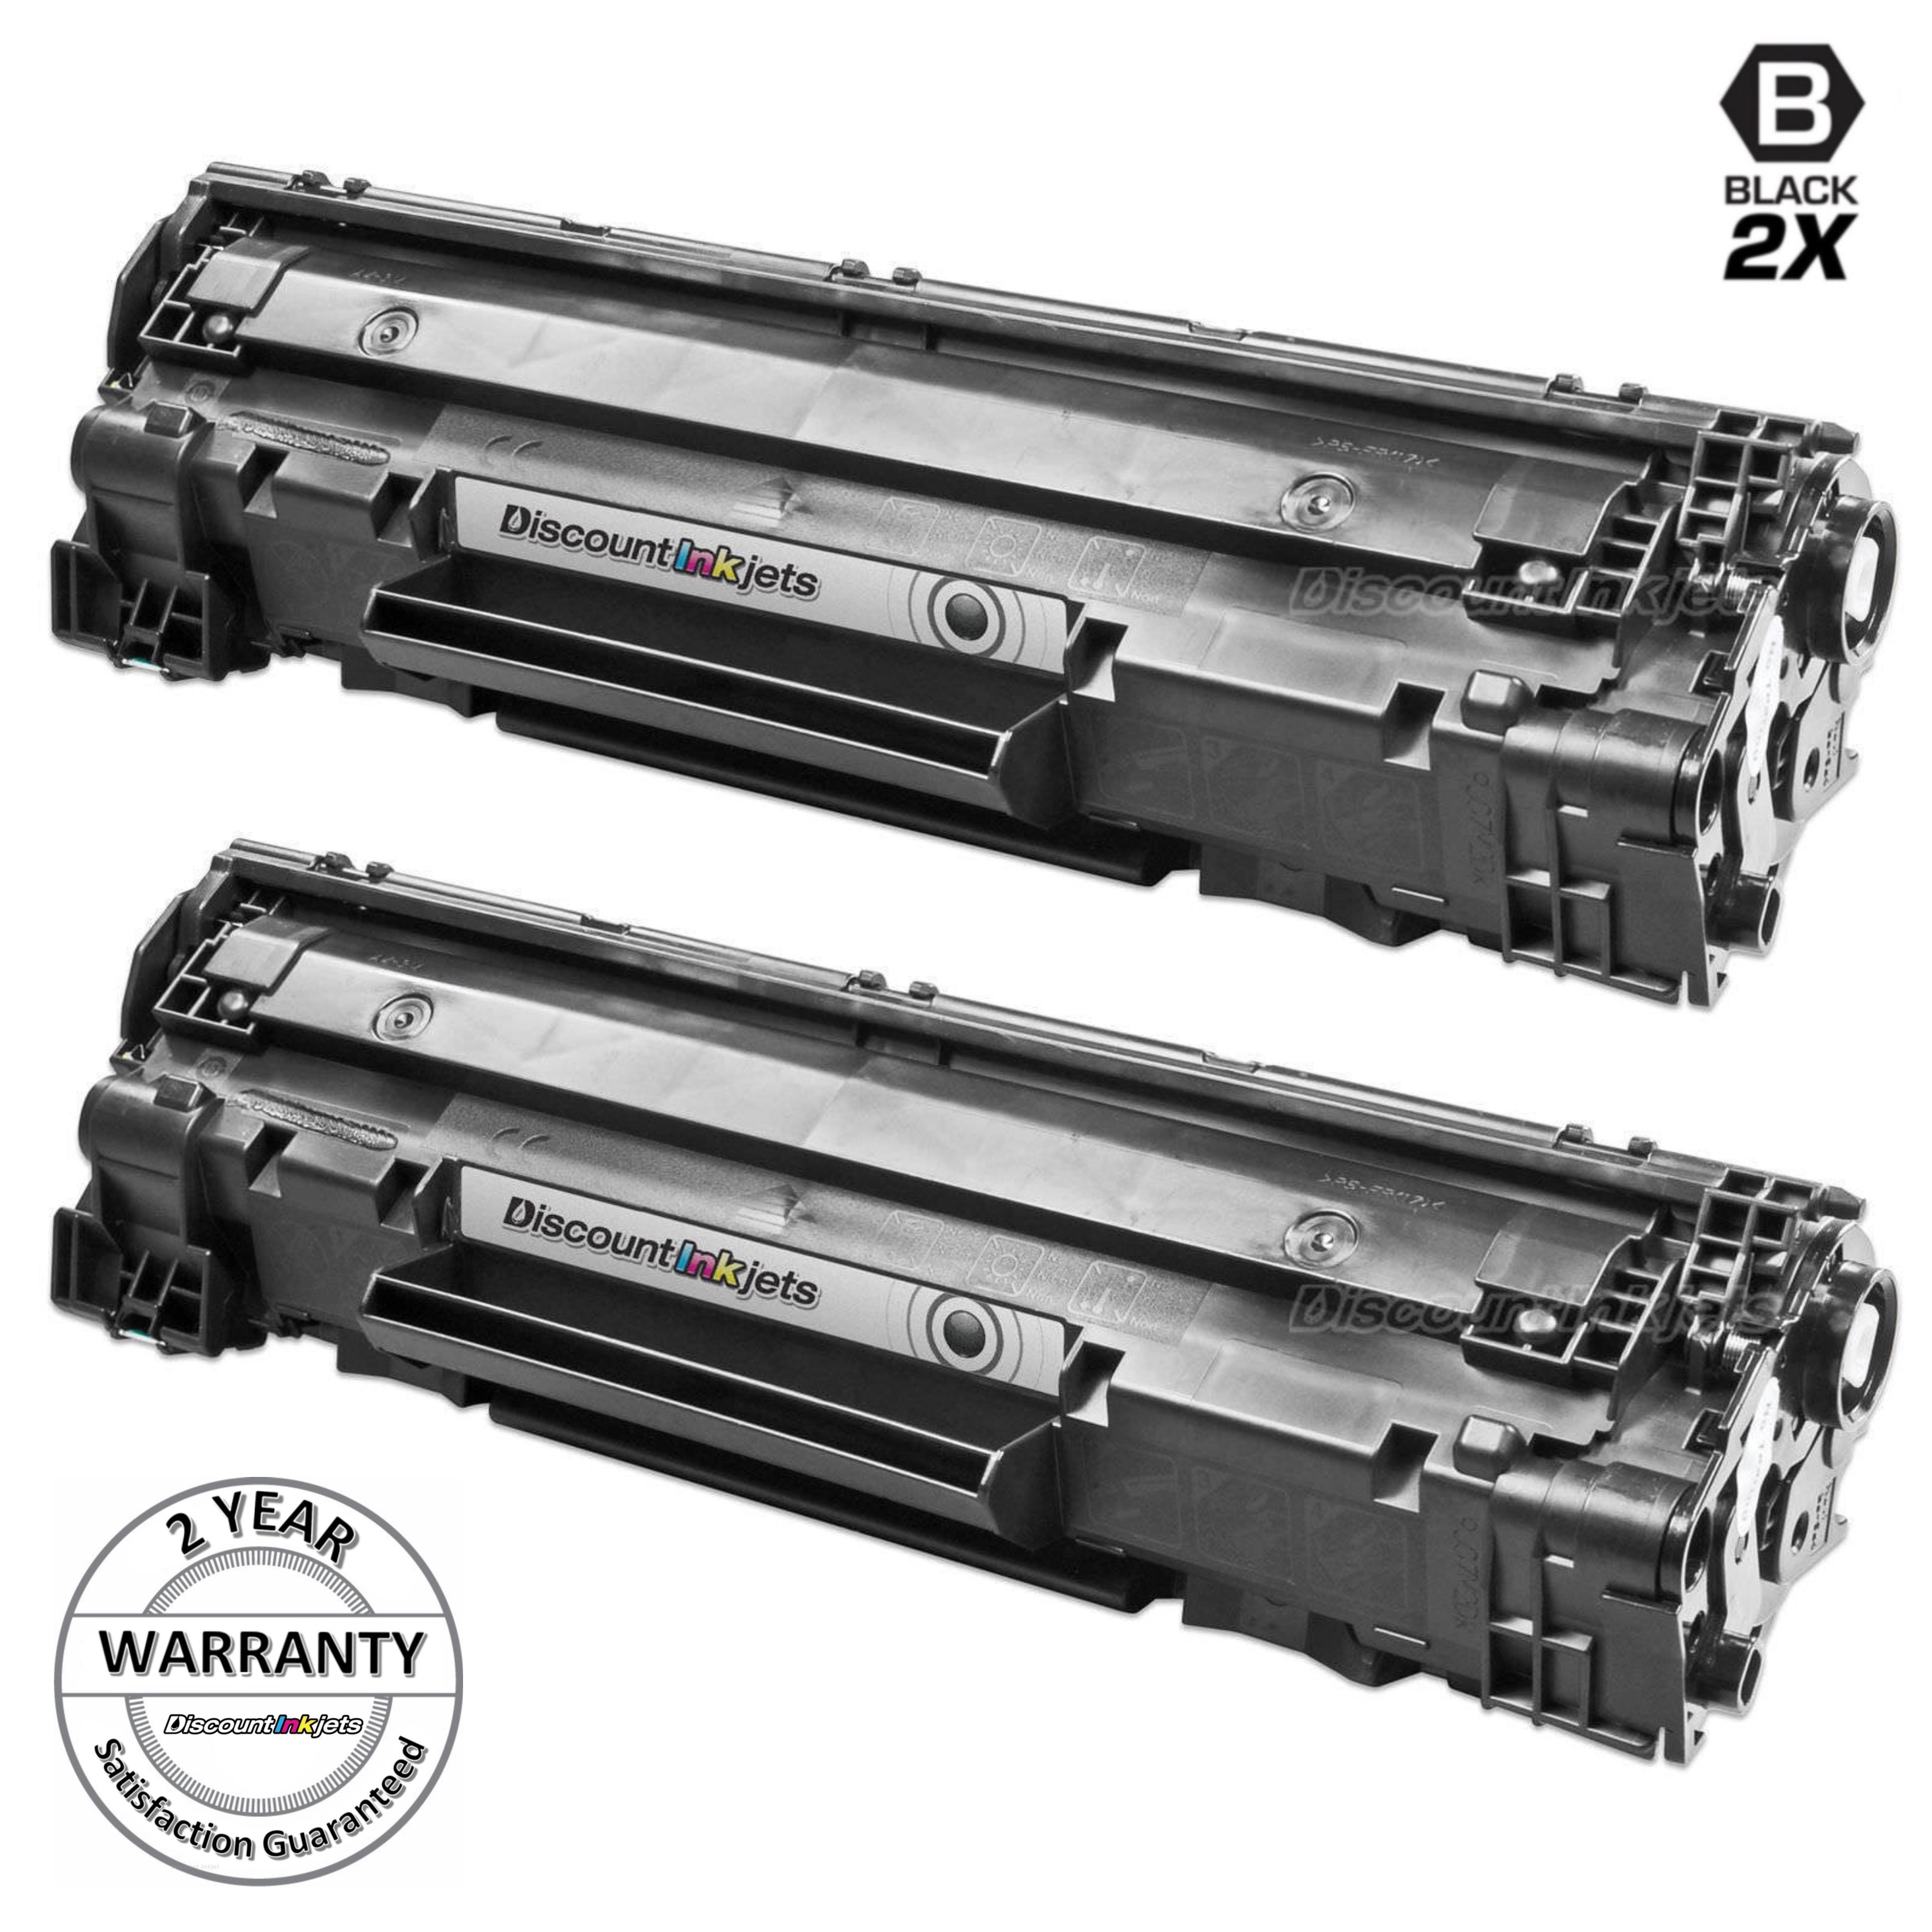 Comp For Hp Ce285a 85a Black Laser Toner Cartridge Laserjet Pro Opc Drum Printer P1102 Katrid 2pk